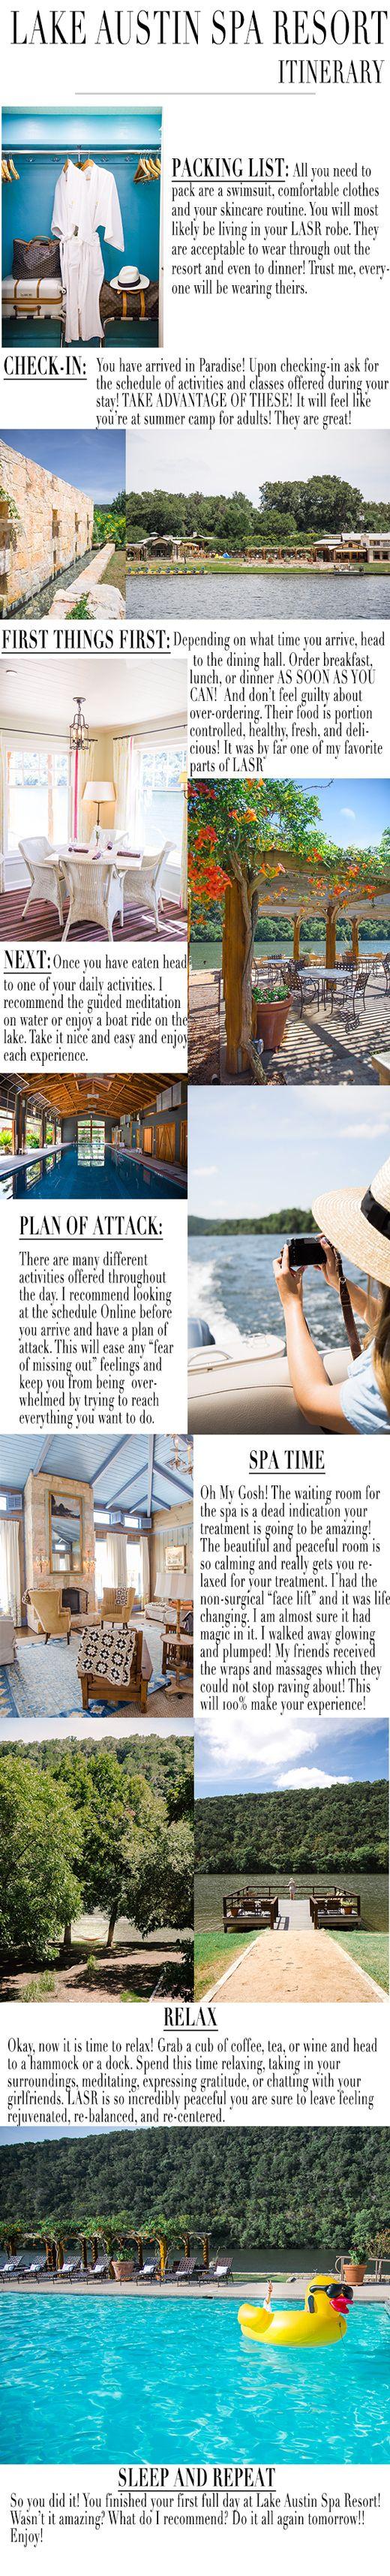 Best 25 austin resorts ideas on pinterest hotels in austin tx hotels in austin and tree house resort